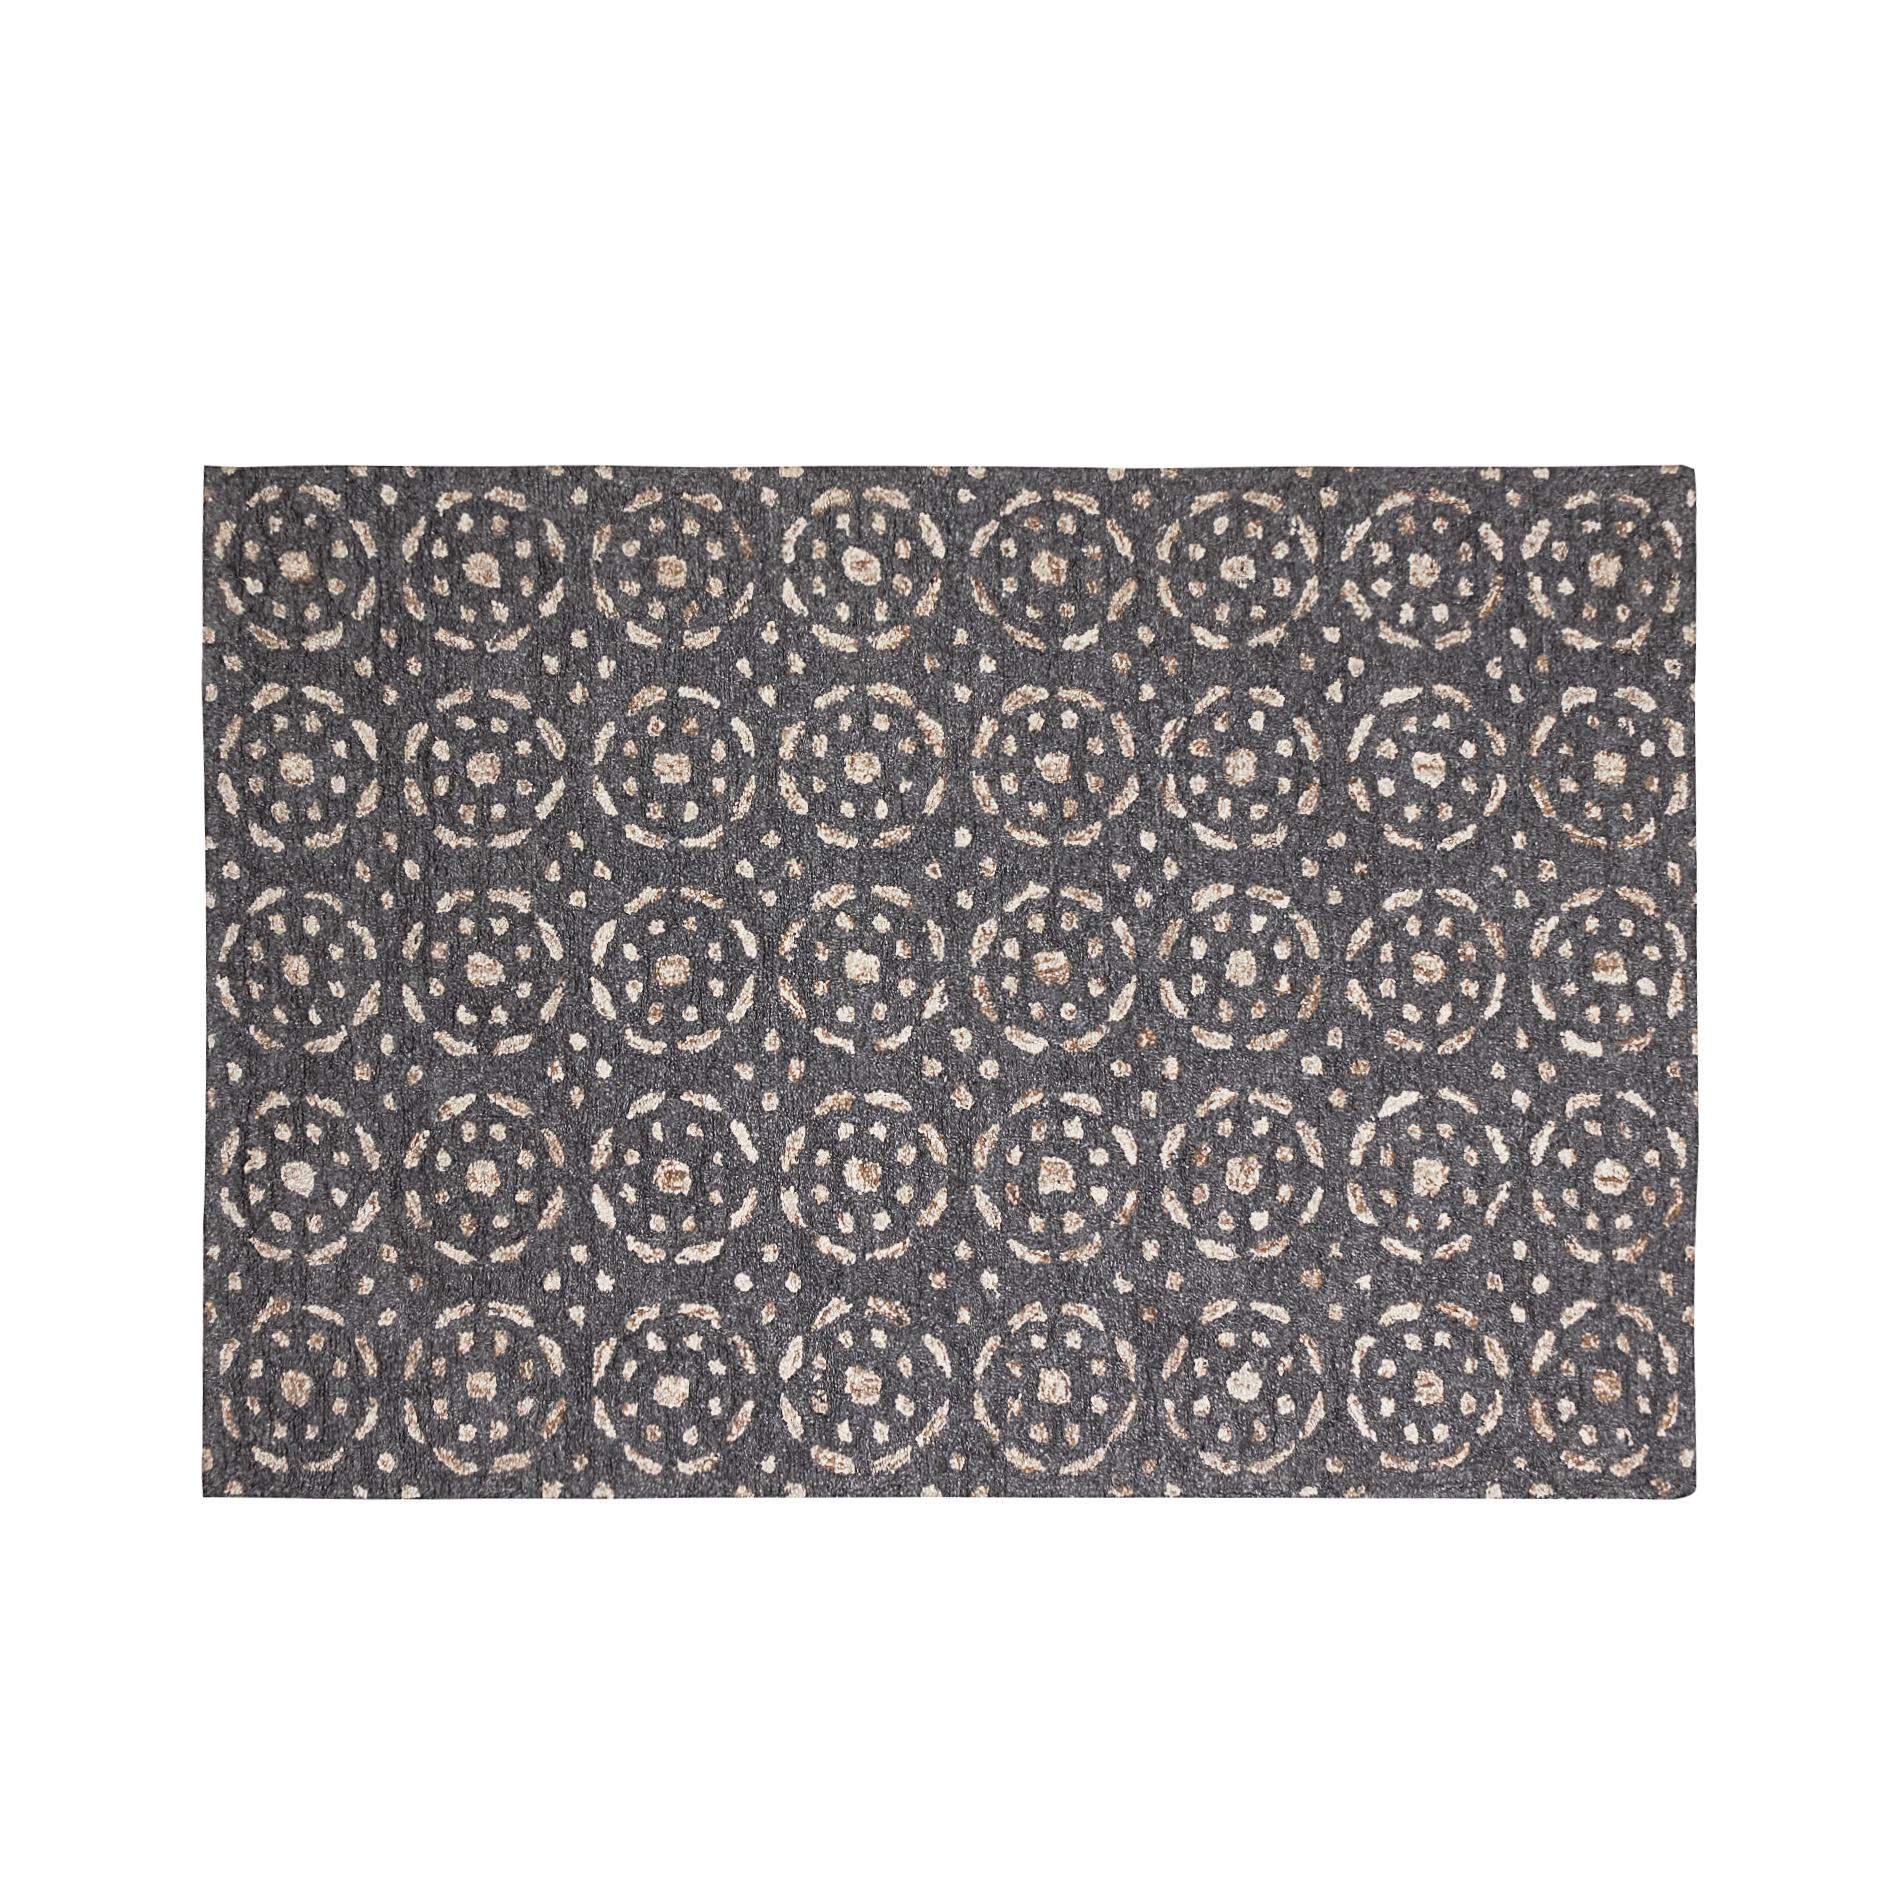 Tappeti moderni grandi dimensioni tappeti esprit home tappeti ricchi di pop seduzione fascino e - Ikea tappeti grandi ...